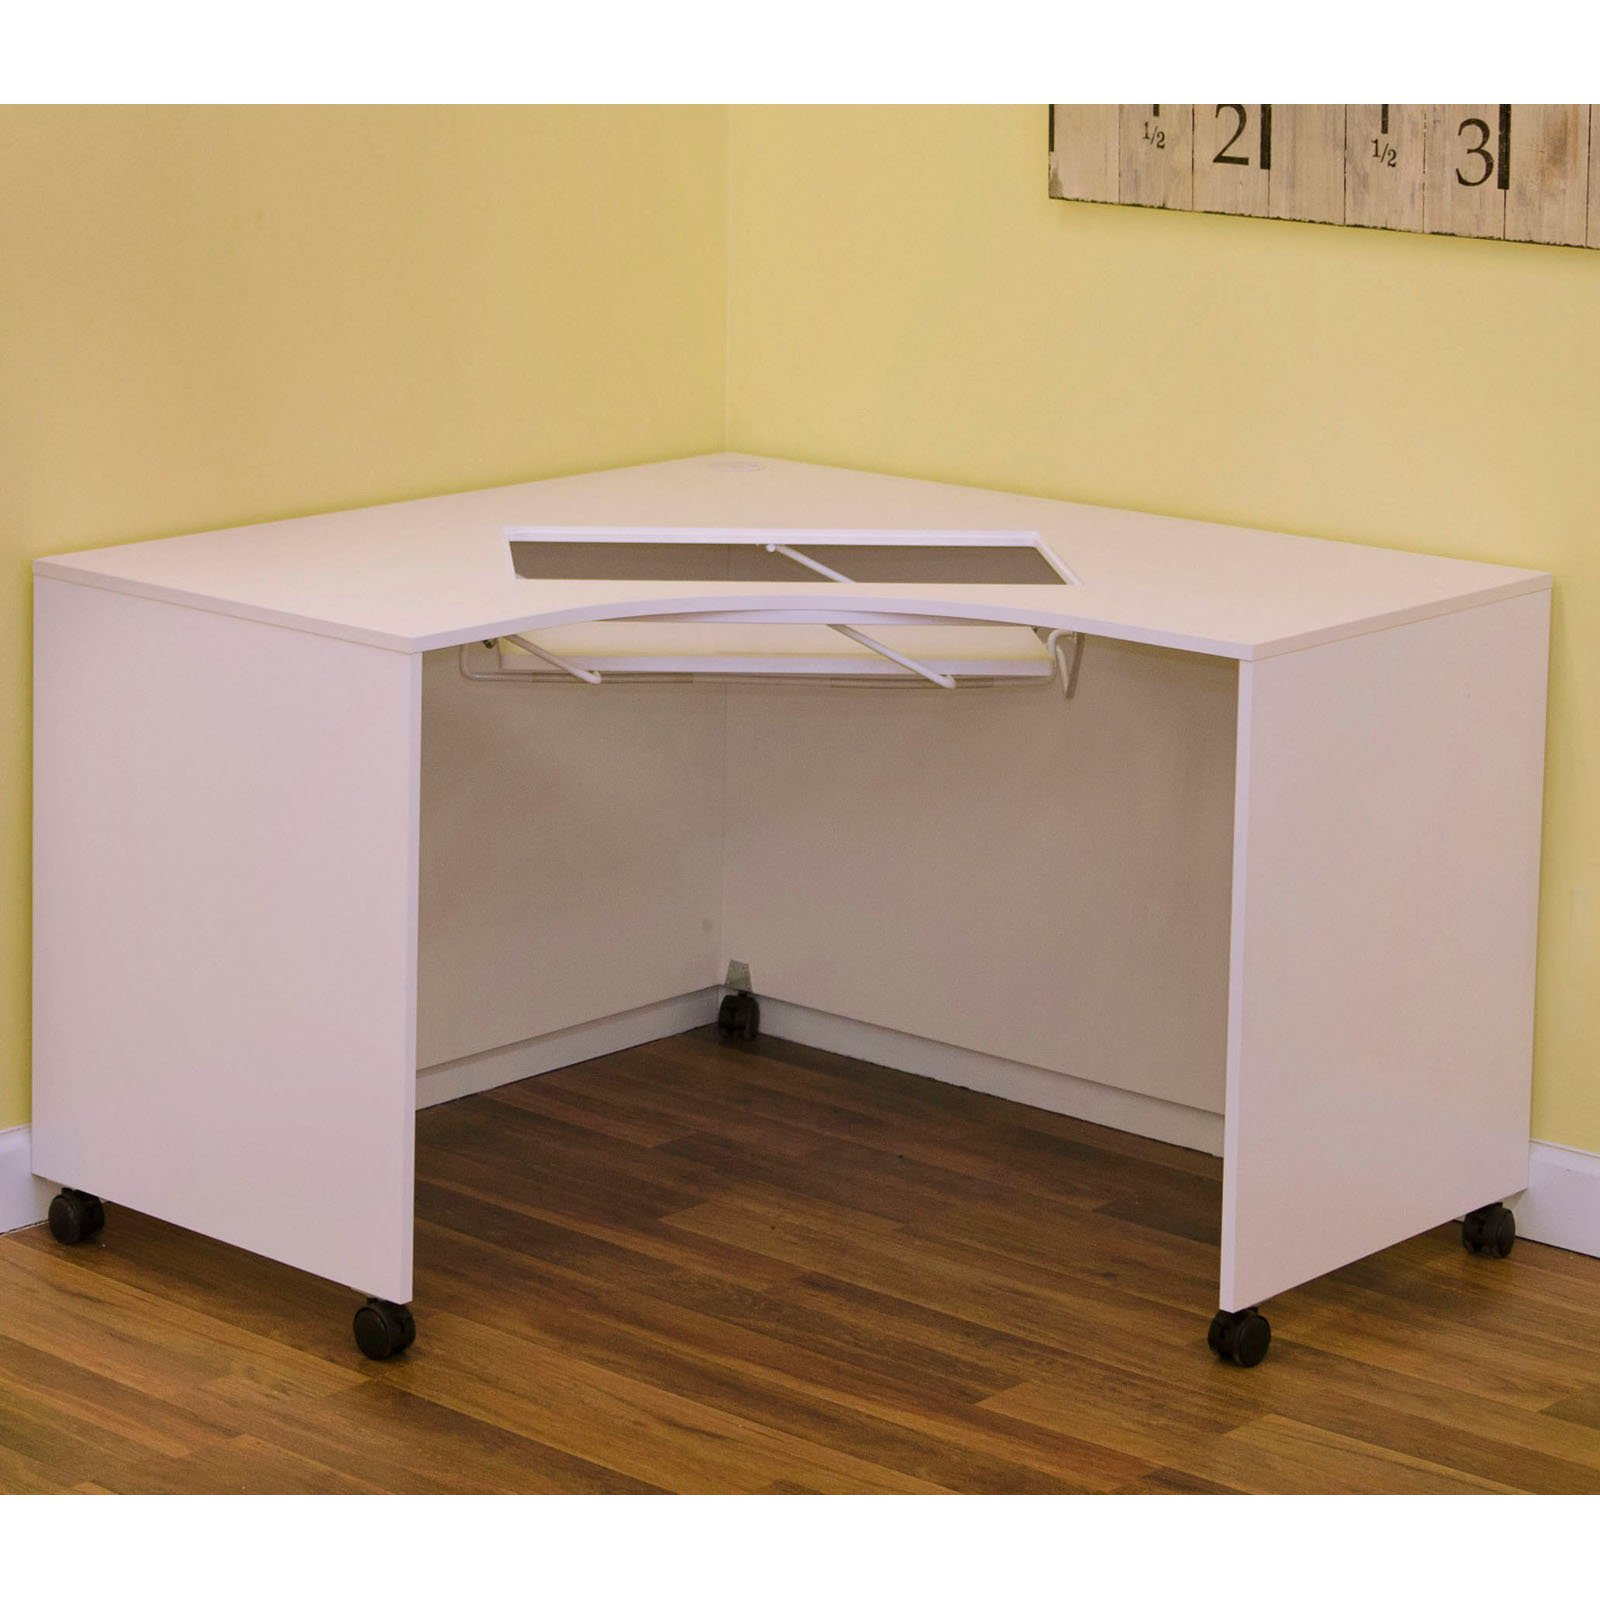 Arrow Group Mod Corner Sewing Cabinet